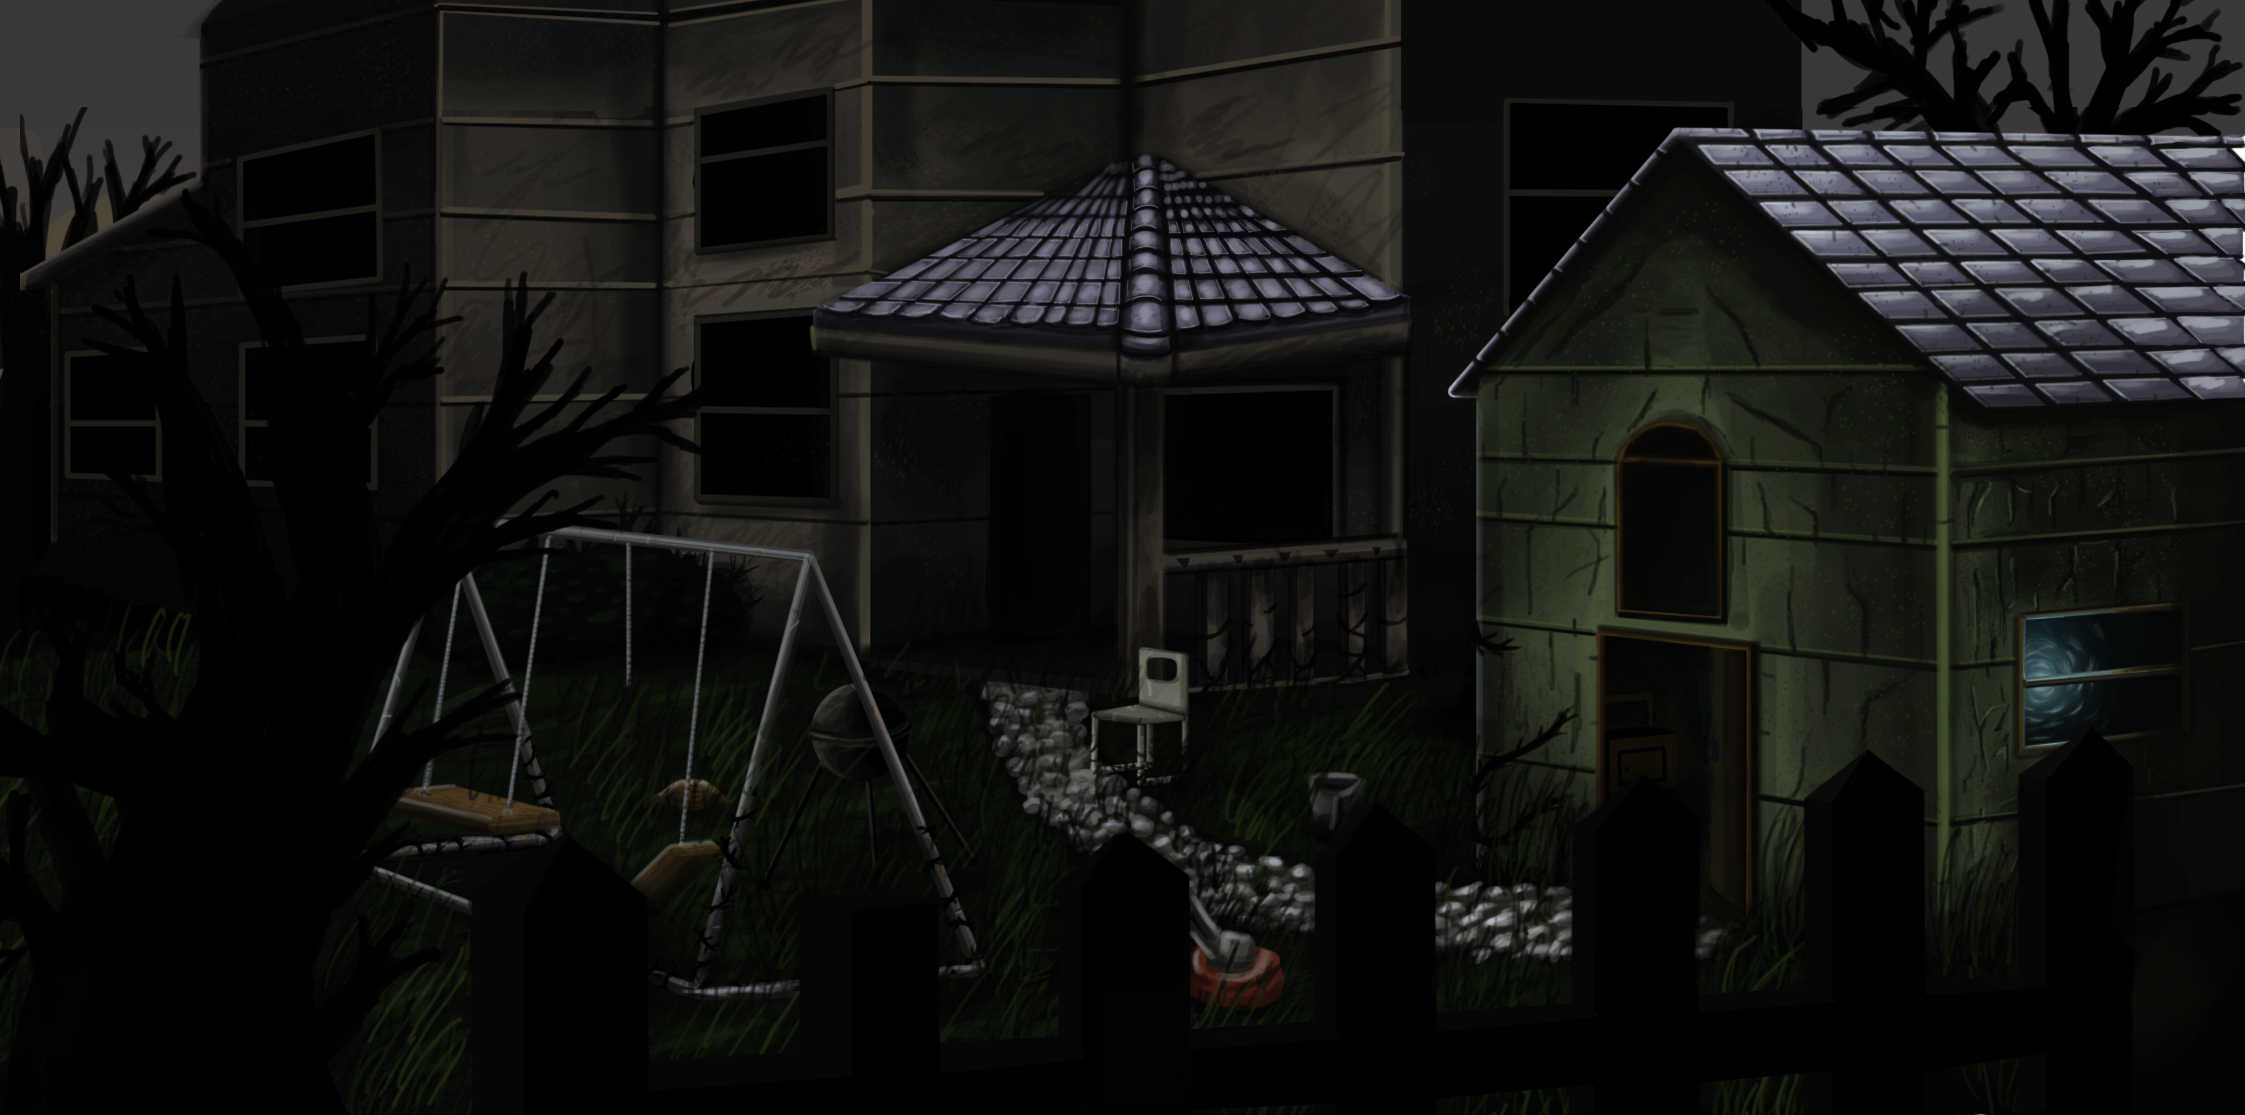 possessed haunted backyard by osirislord on deviantart